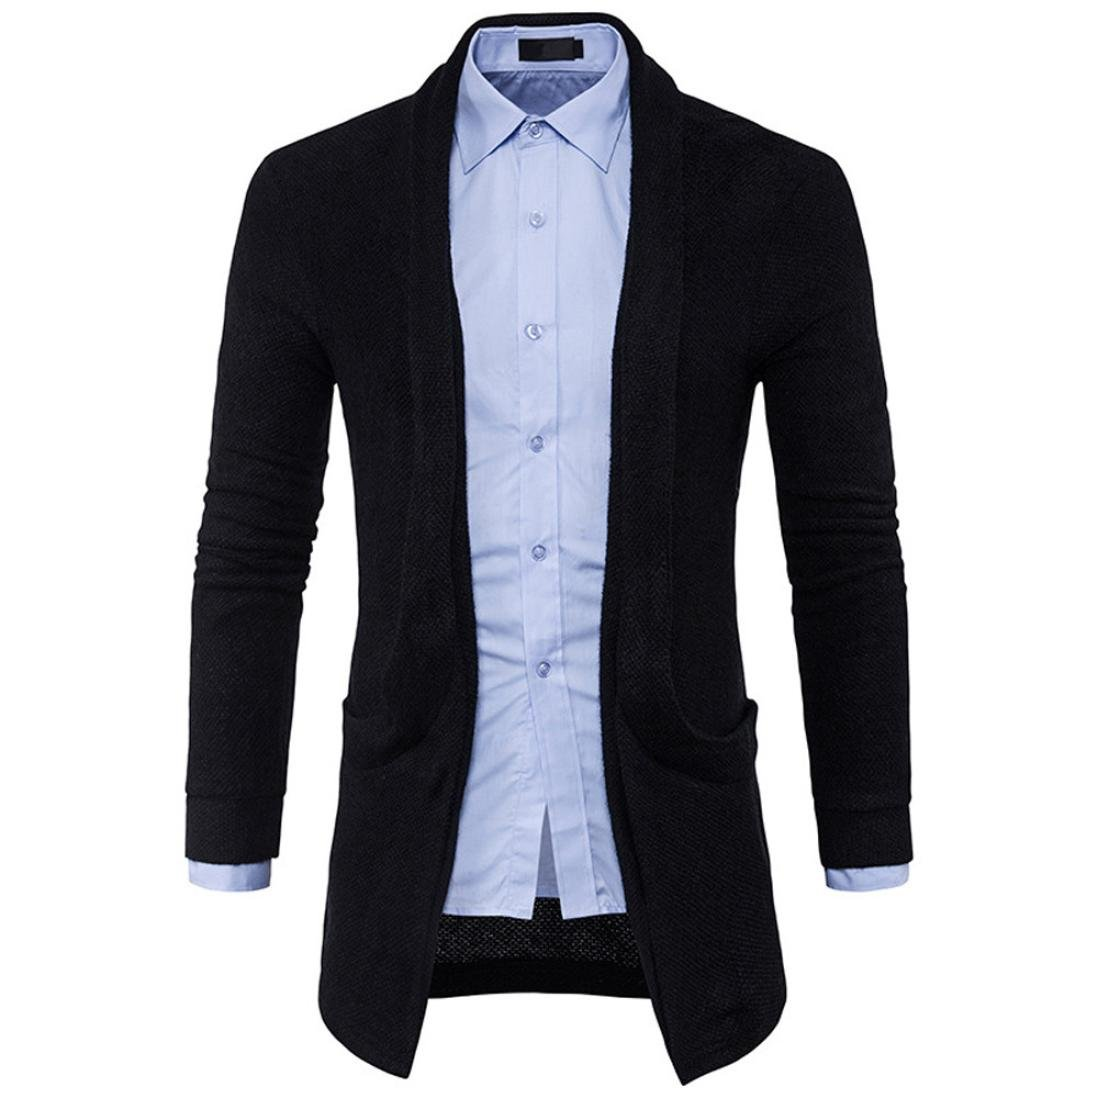 Cardigan,FUNIC Mens Slim knitted Sweater Cardigan Fashion Long Coat Jacket (M, Black)